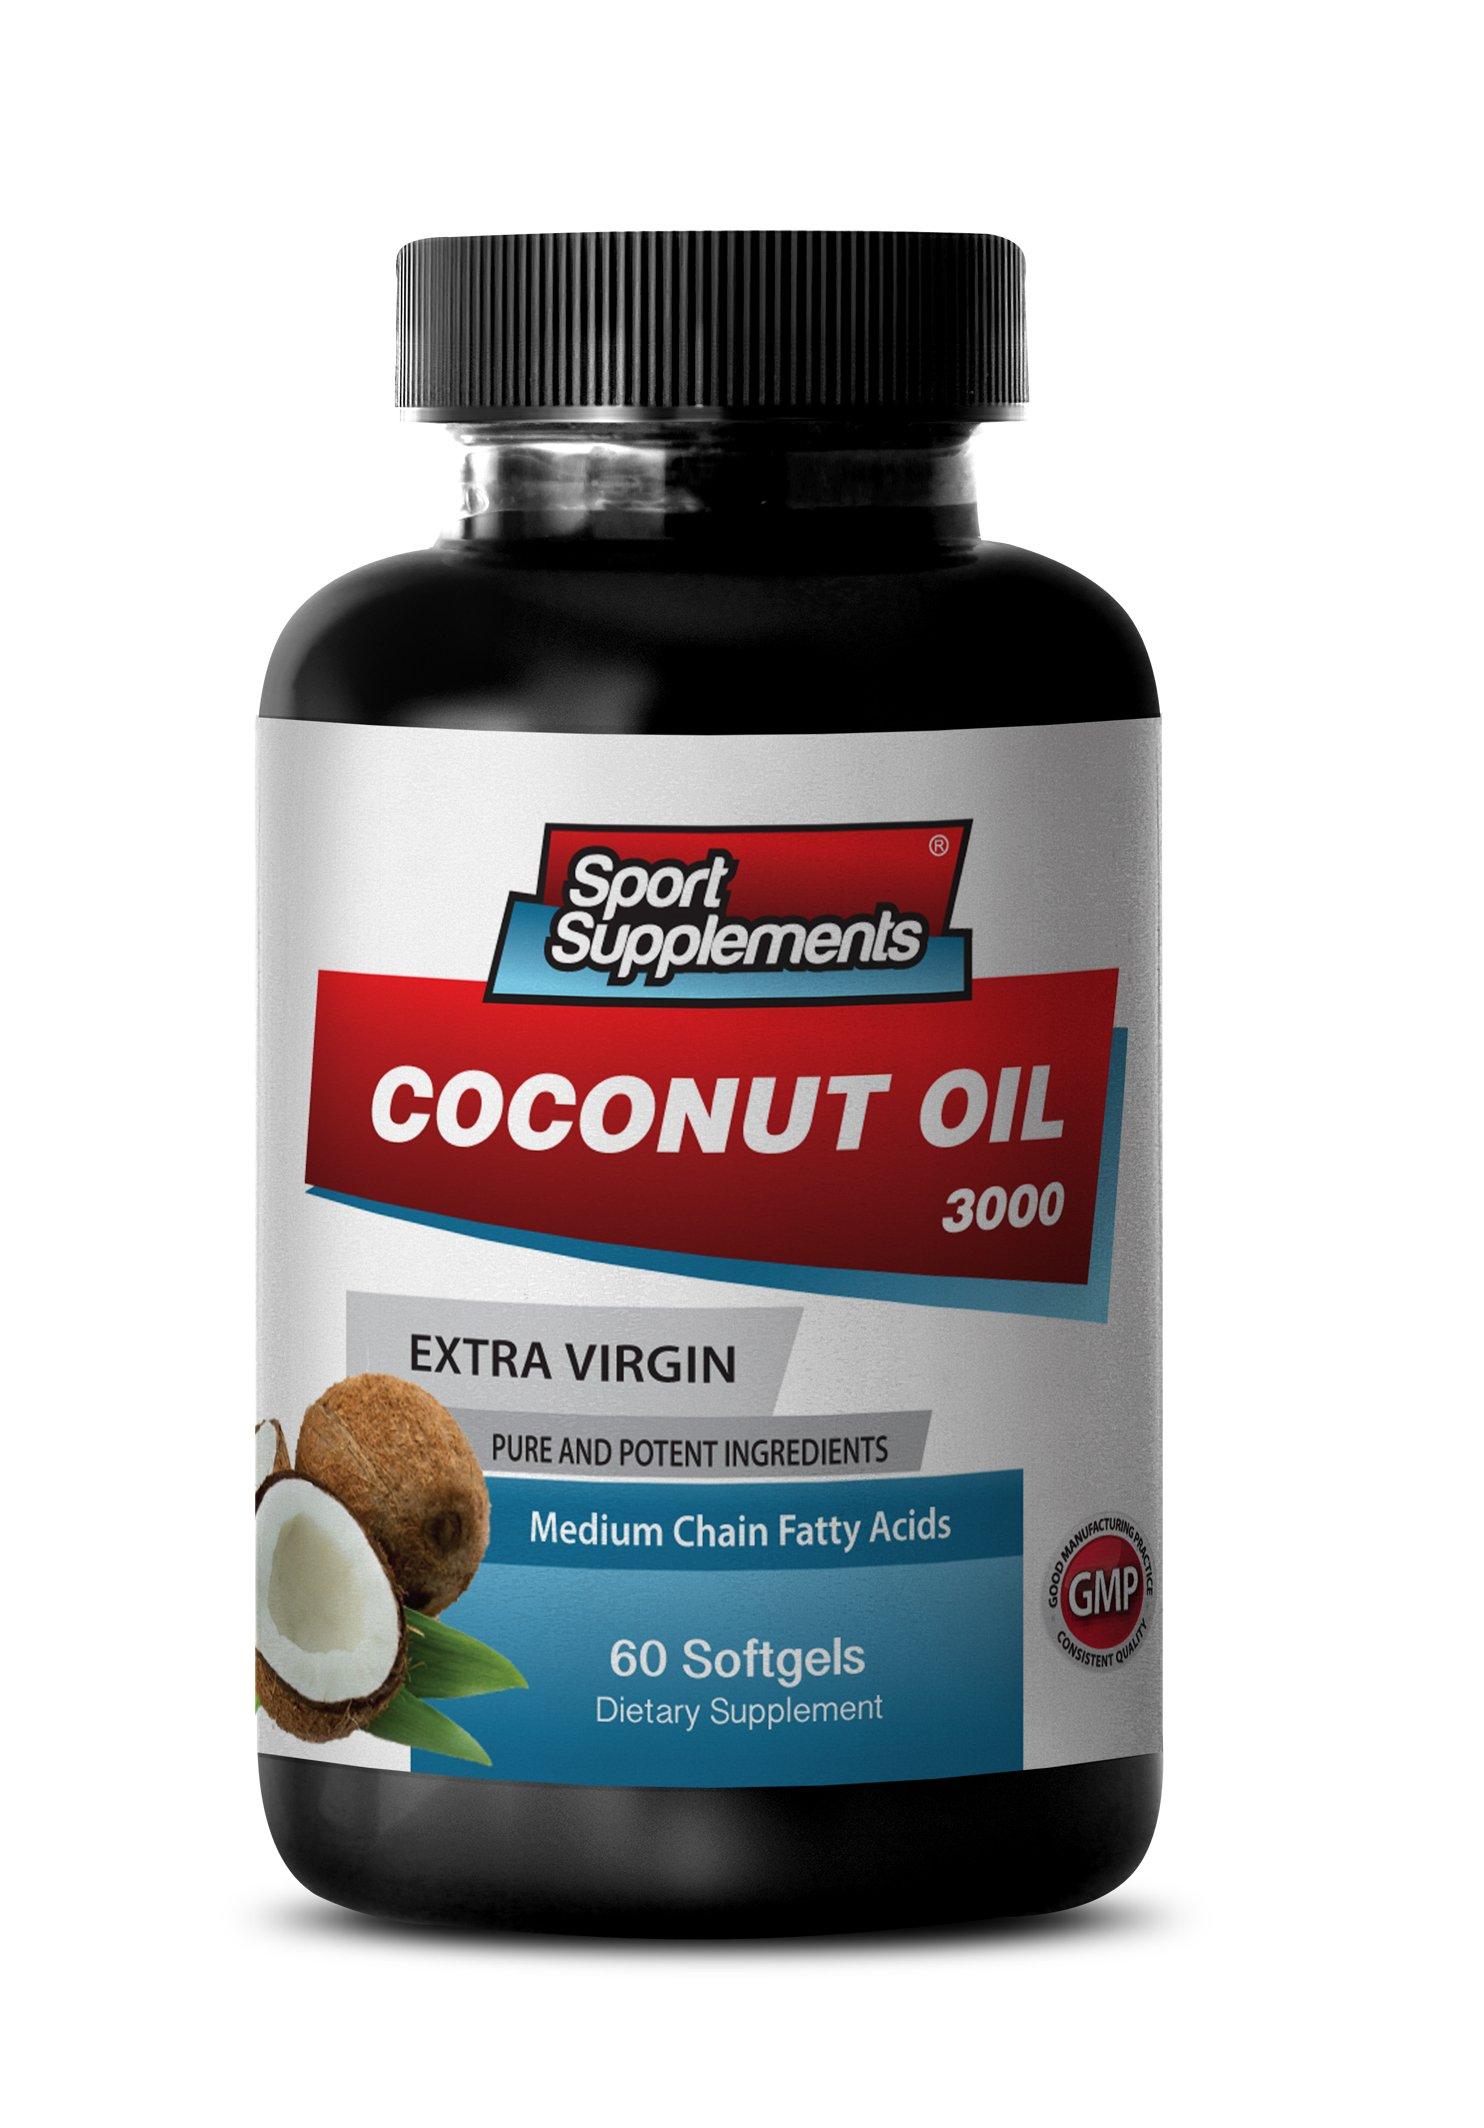 Organic Coconut Oil Cold Pressed - Extra Virgin Coconut Oil 3,000mg - Coconut Oil Healthy Energy Booster (1 Bottle 60 Softgels)